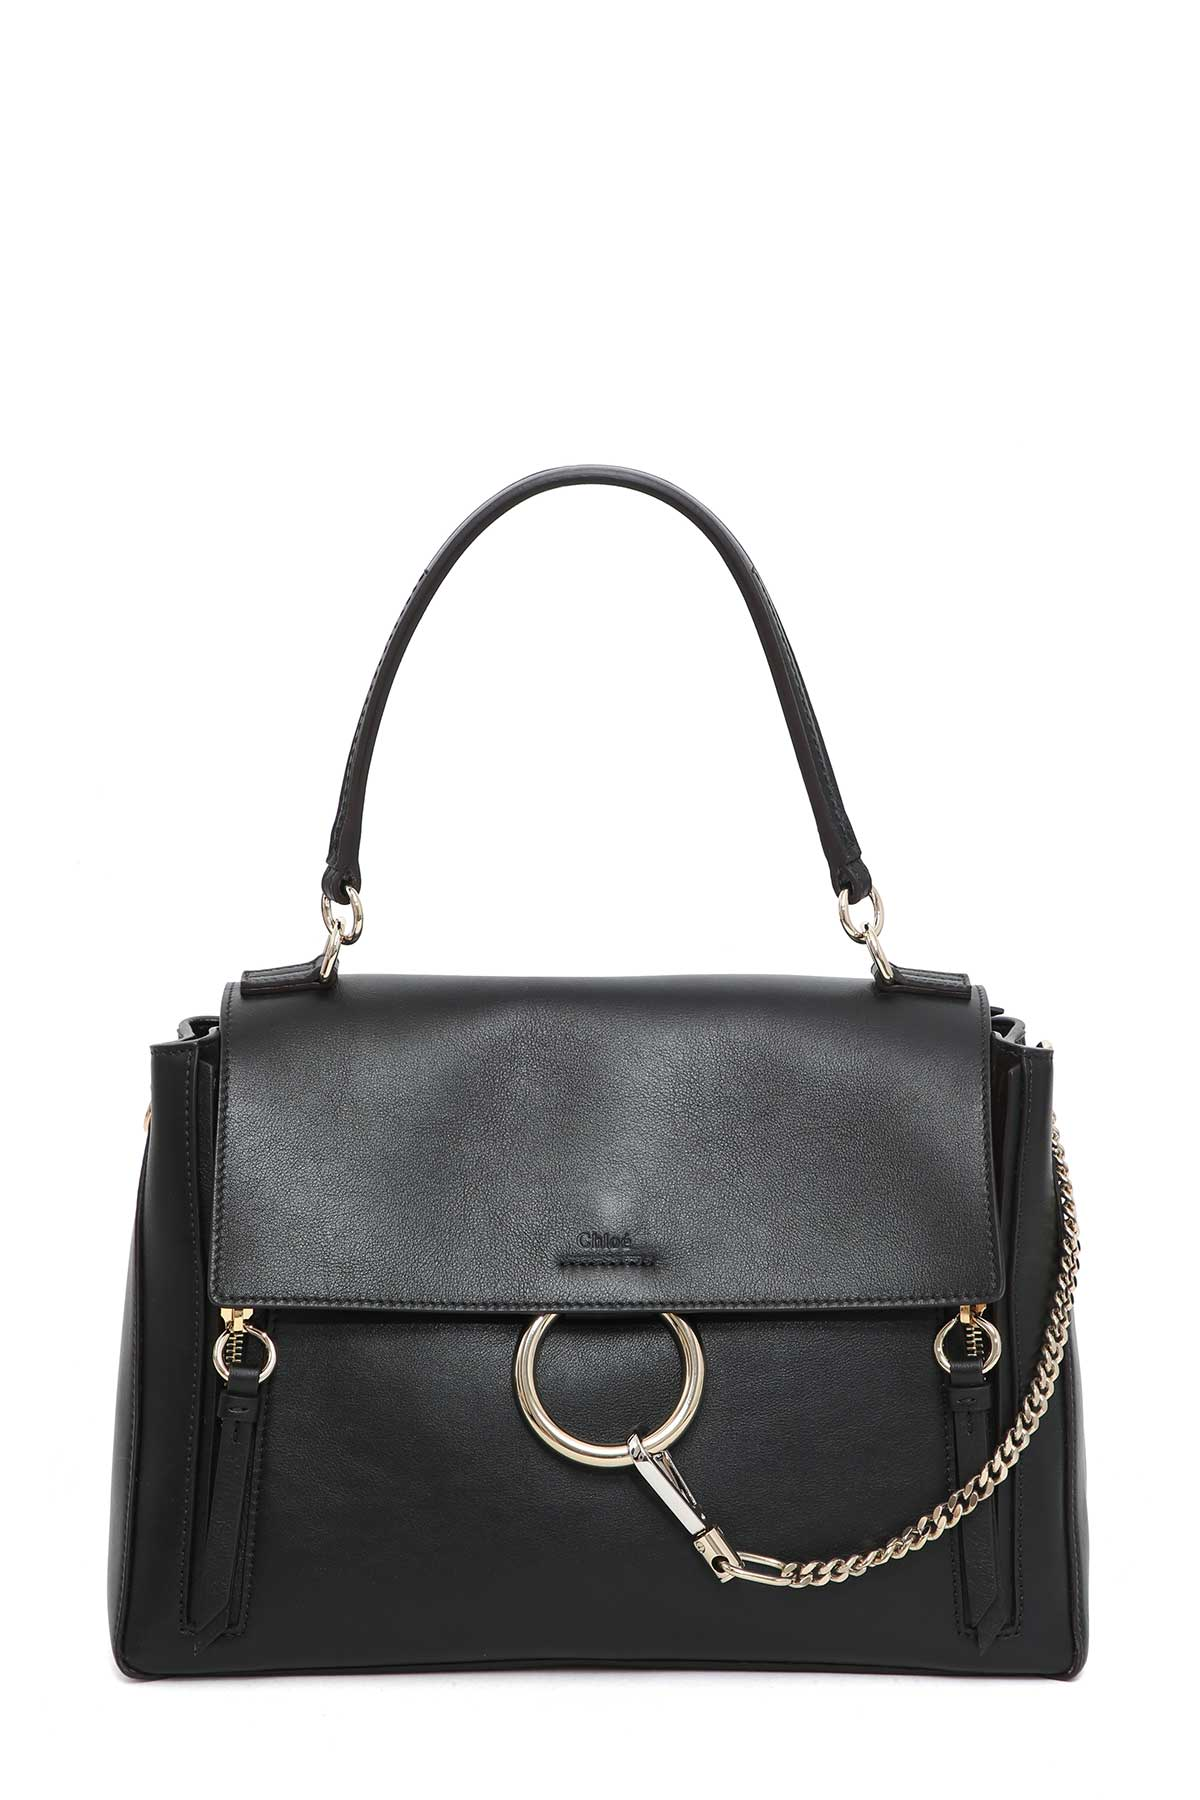 Chloé Chloé faye Medium Day Bag